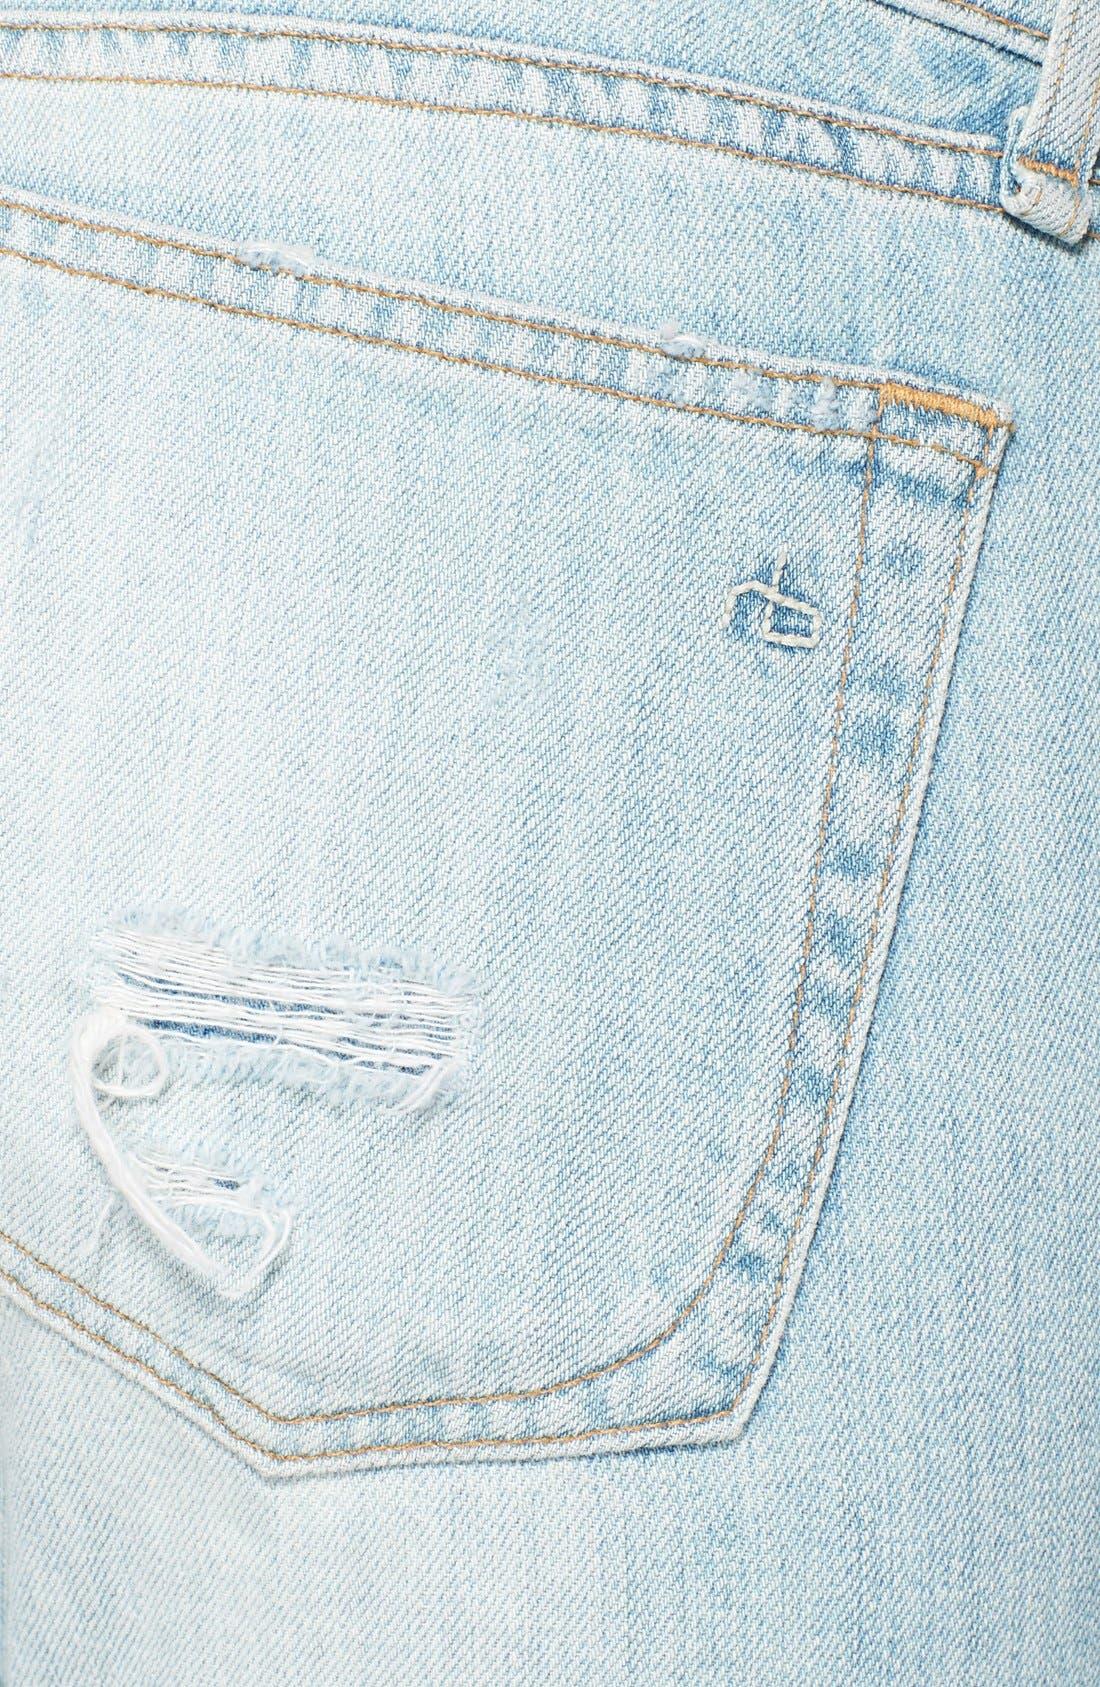 'The Dre' Distressed Skinny Boyfriend Jeans,                             Alternate thumbnail 3, color,                             455